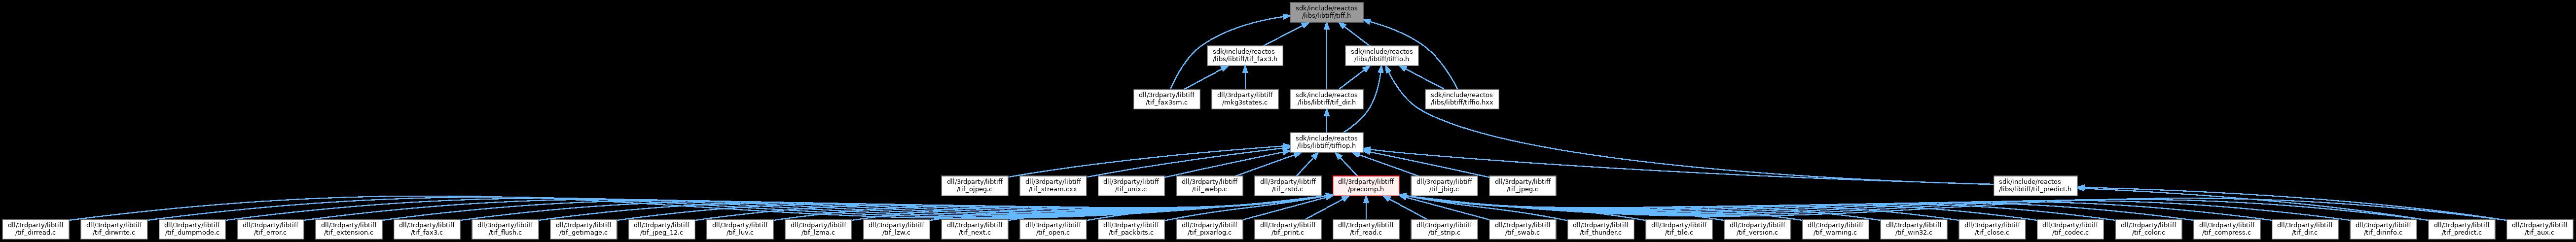 ReactOS: sdk/include/reactos/libs/libtiff/tiff h File Reference